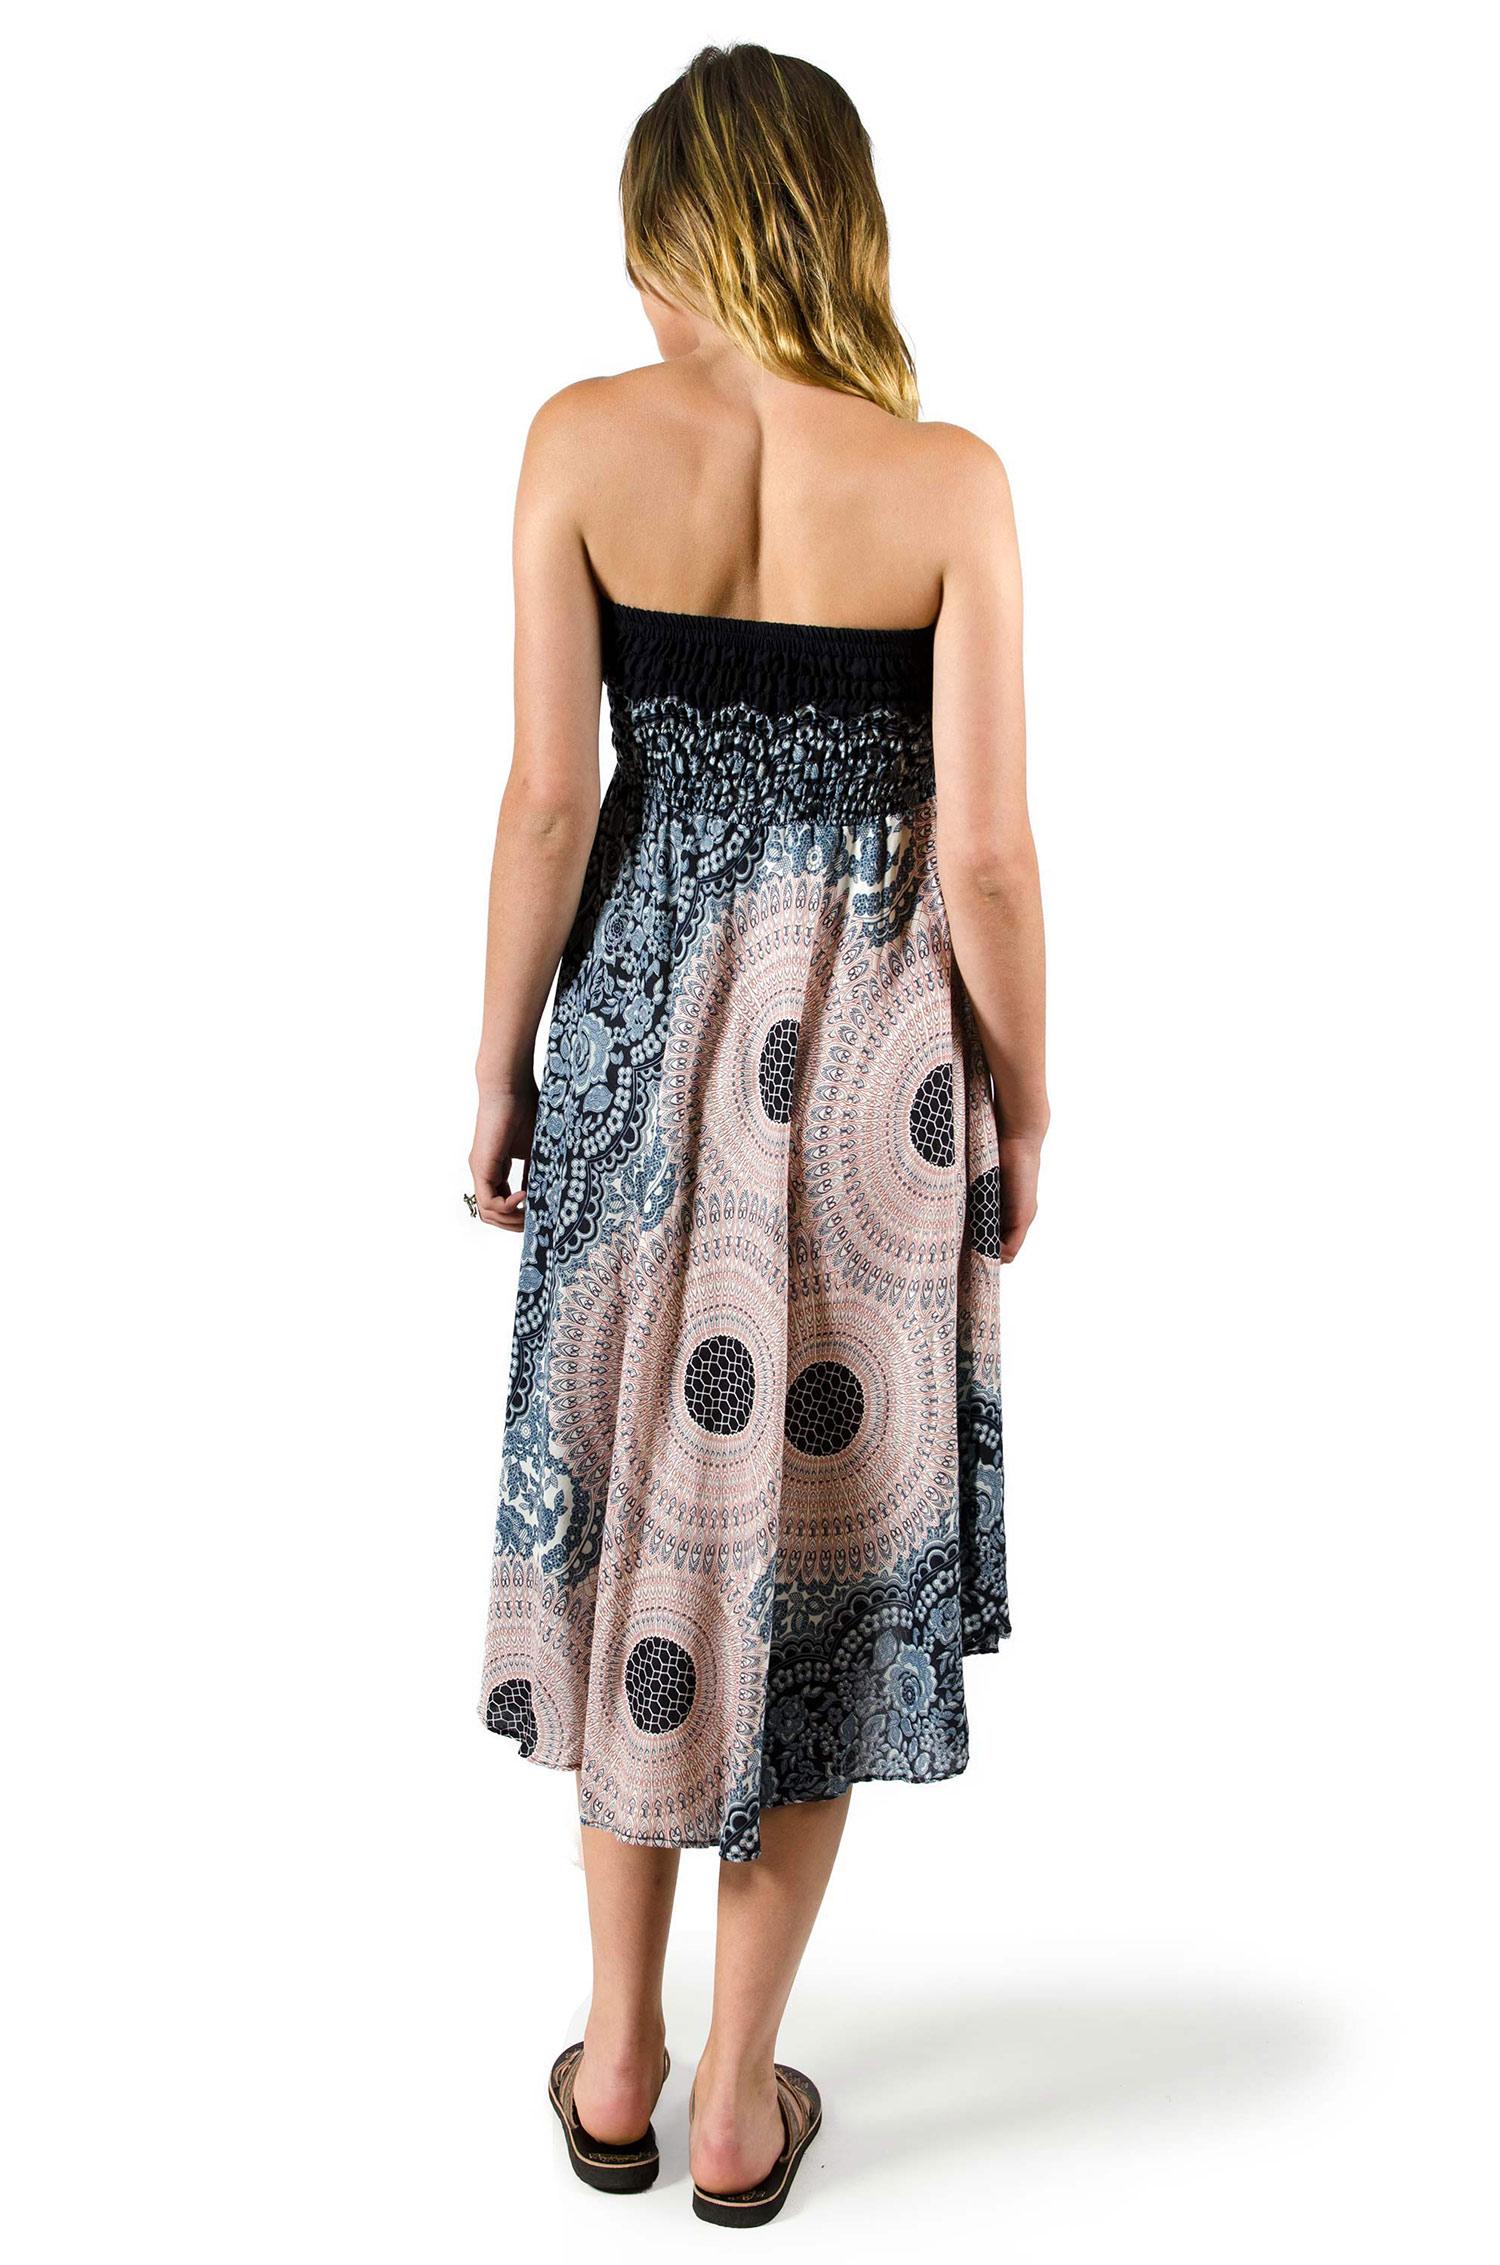 Honeycomb Print Dress / Skirt Grey